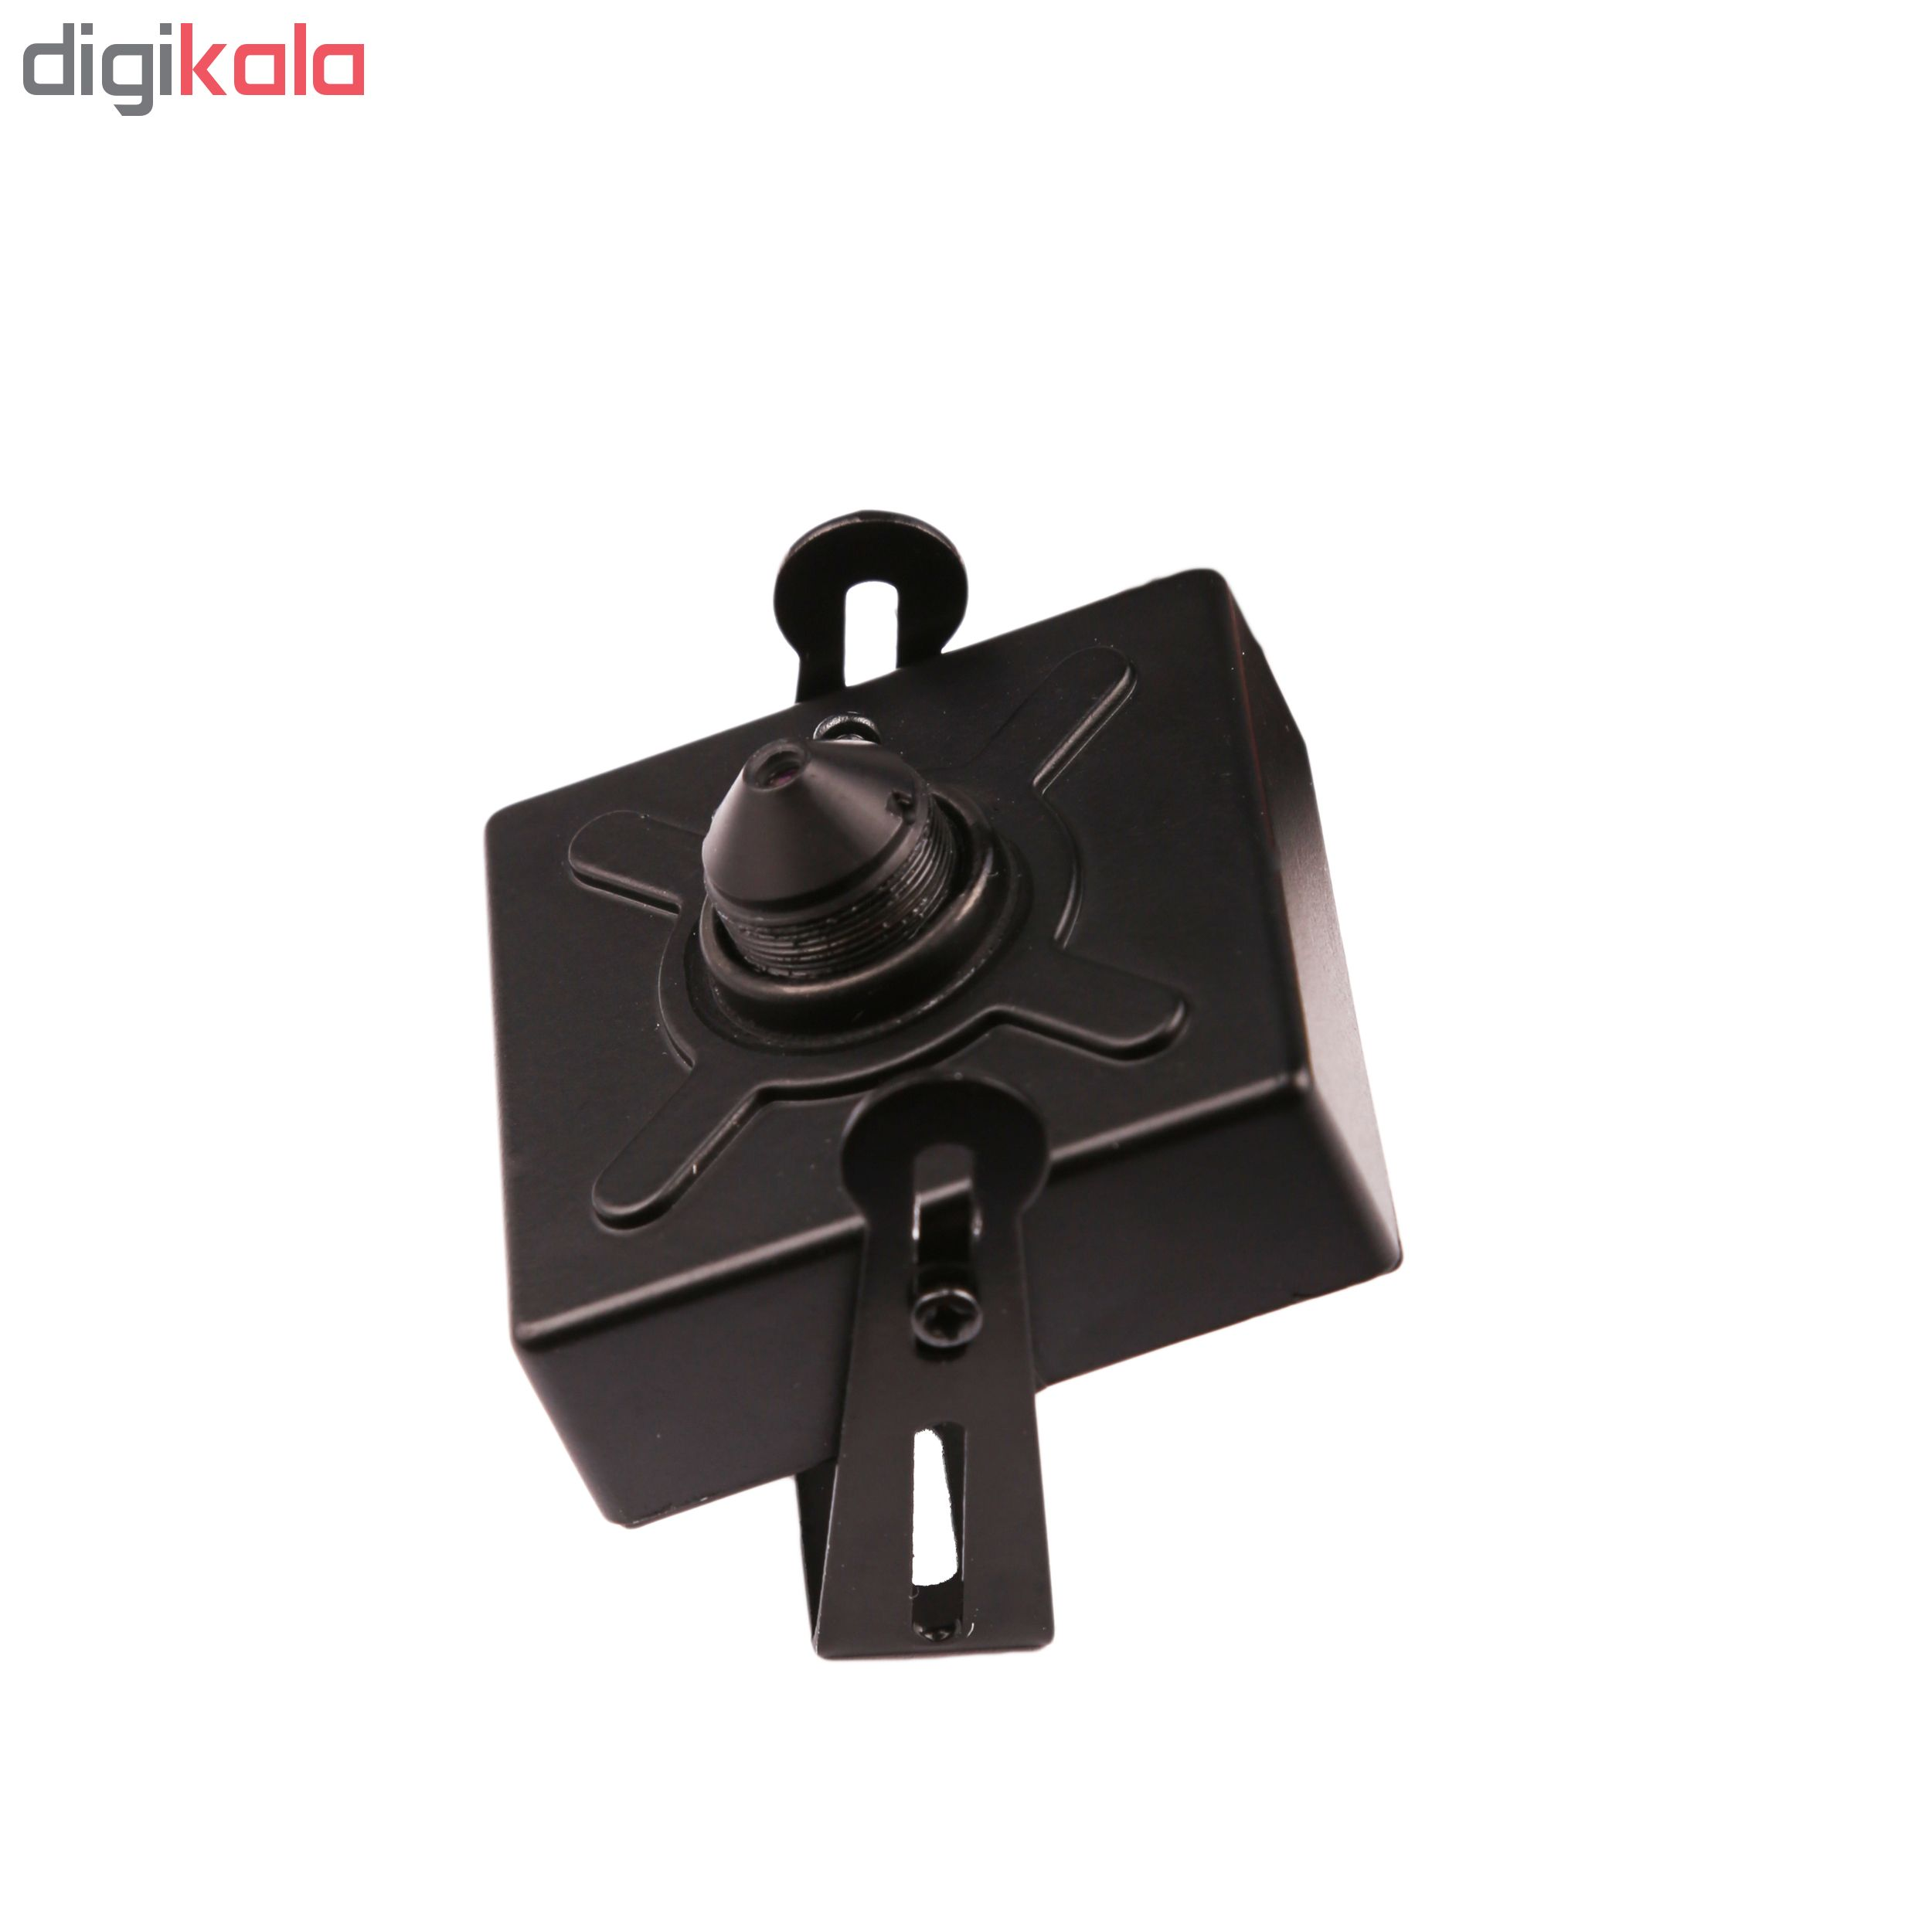 دوربین مداربسته آنالوگ مدل DR-1820